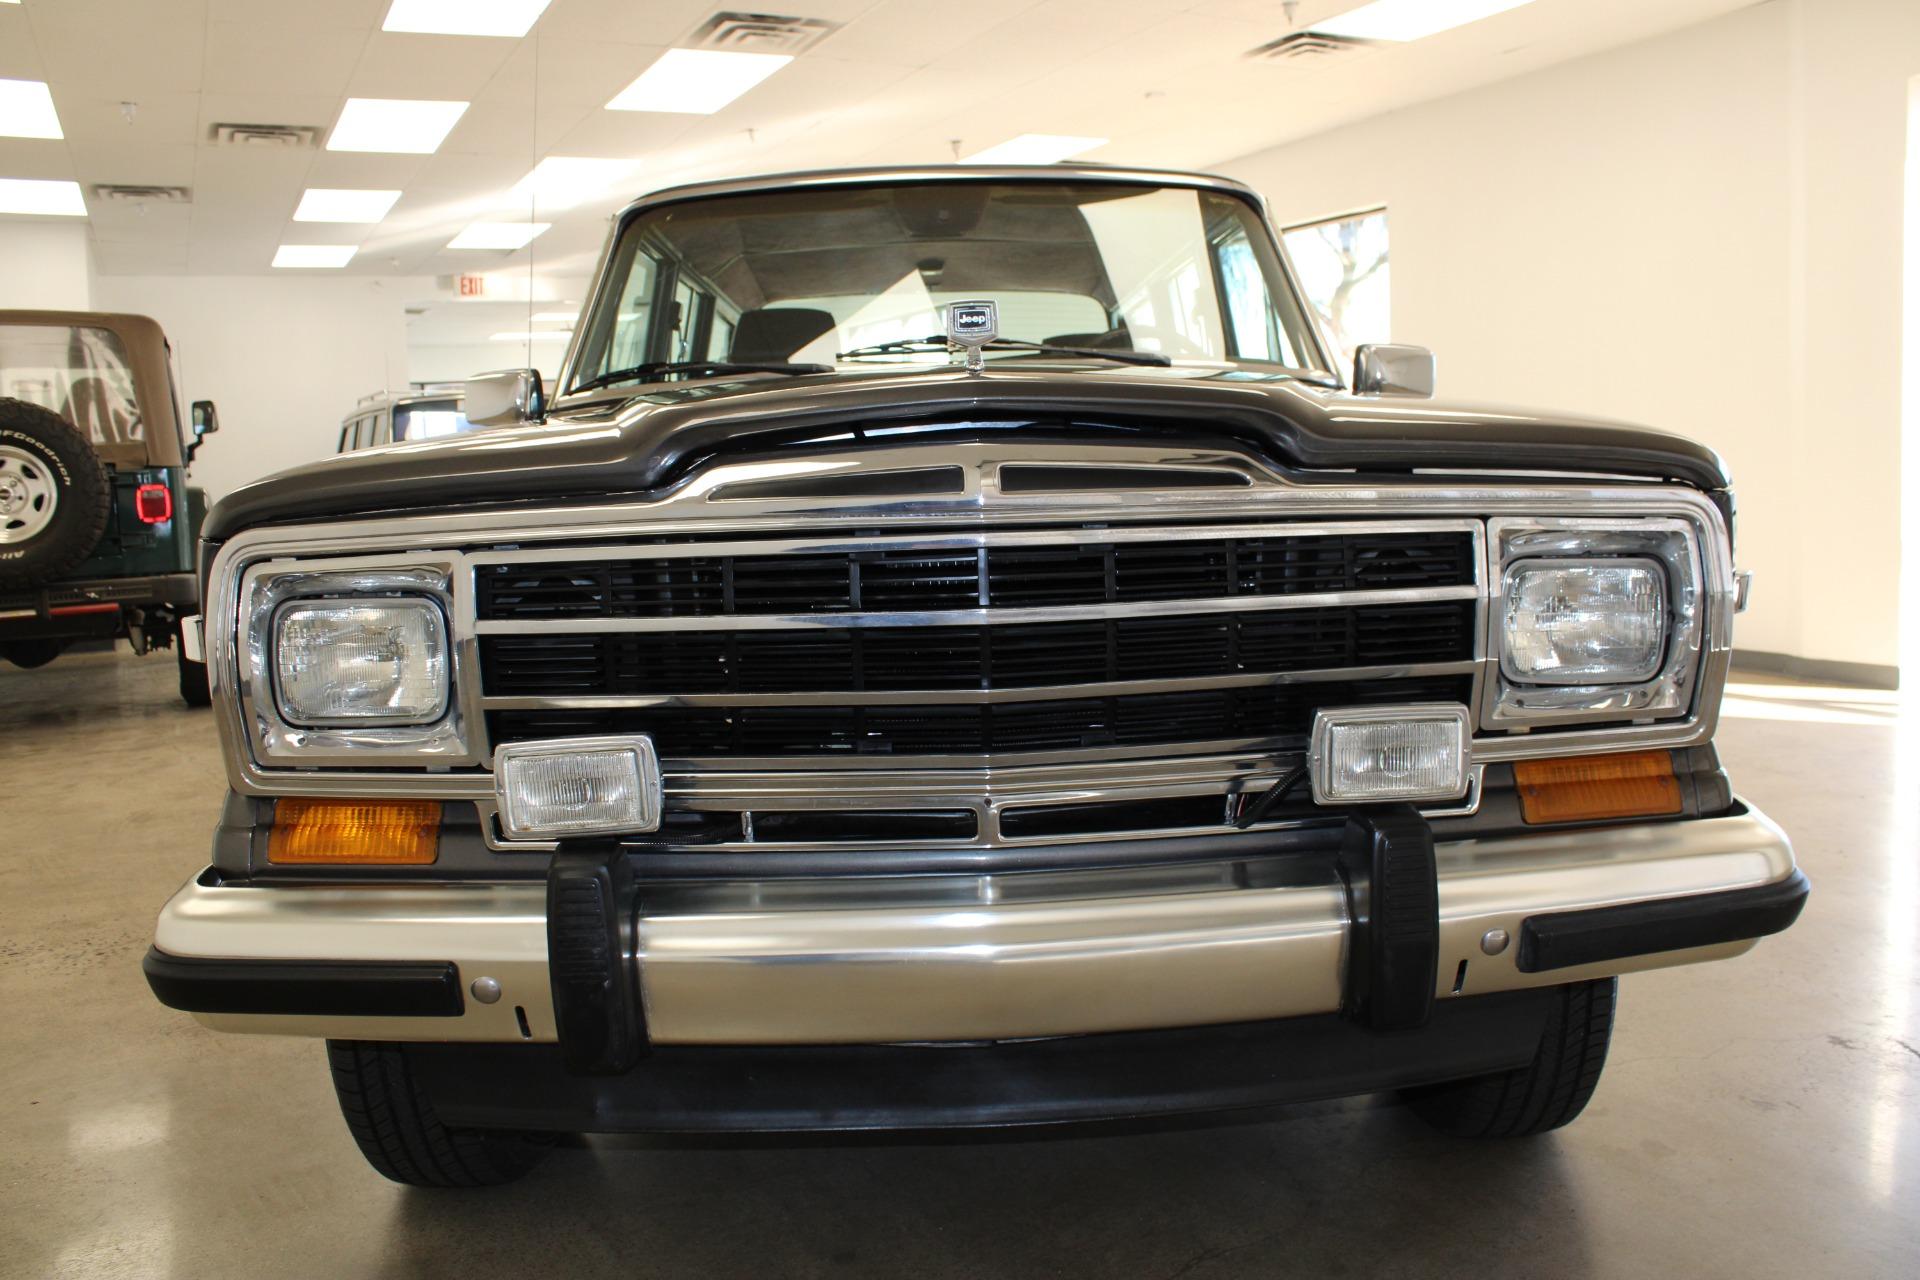 Used-1989-Jeep-Grand-Wagoneer-Wrangler